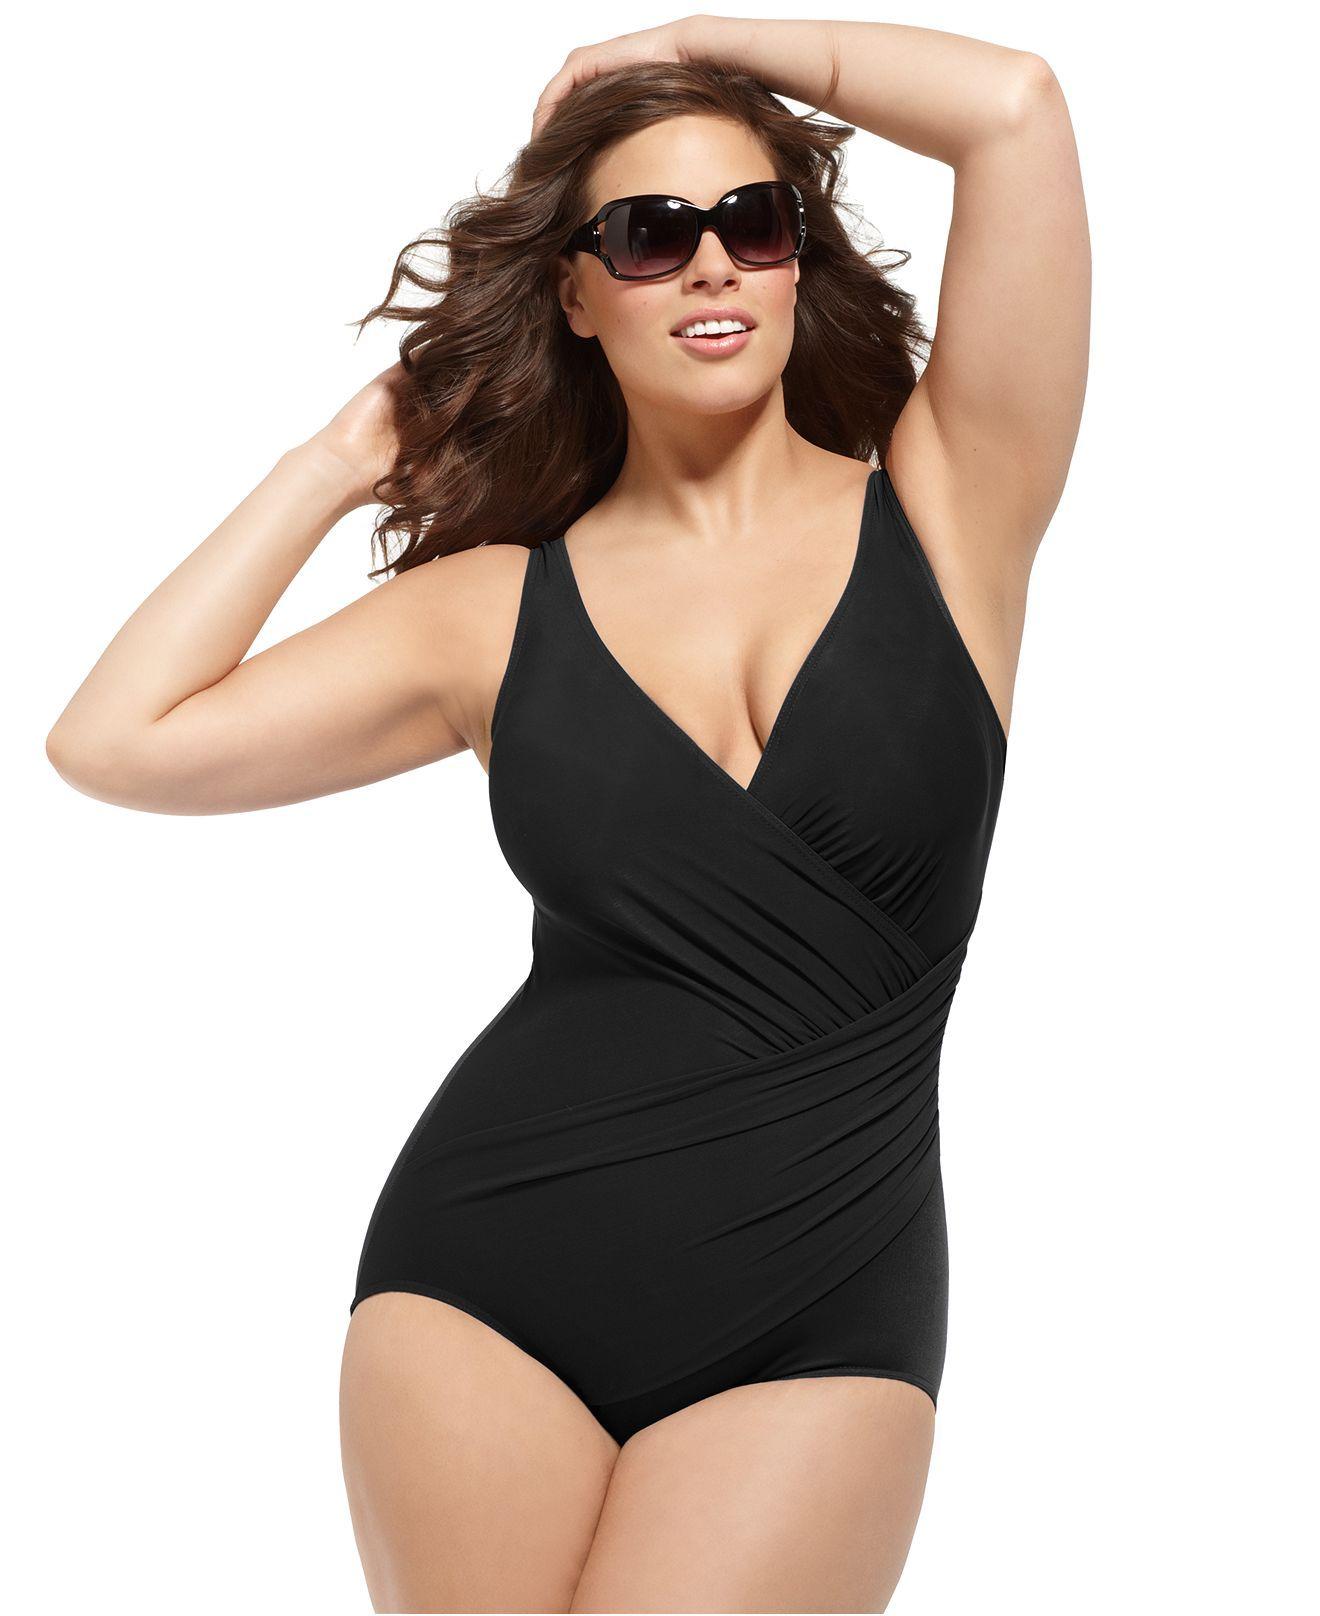 miraclesuit plus size swimsuit, oceanus tummy-control one-piece